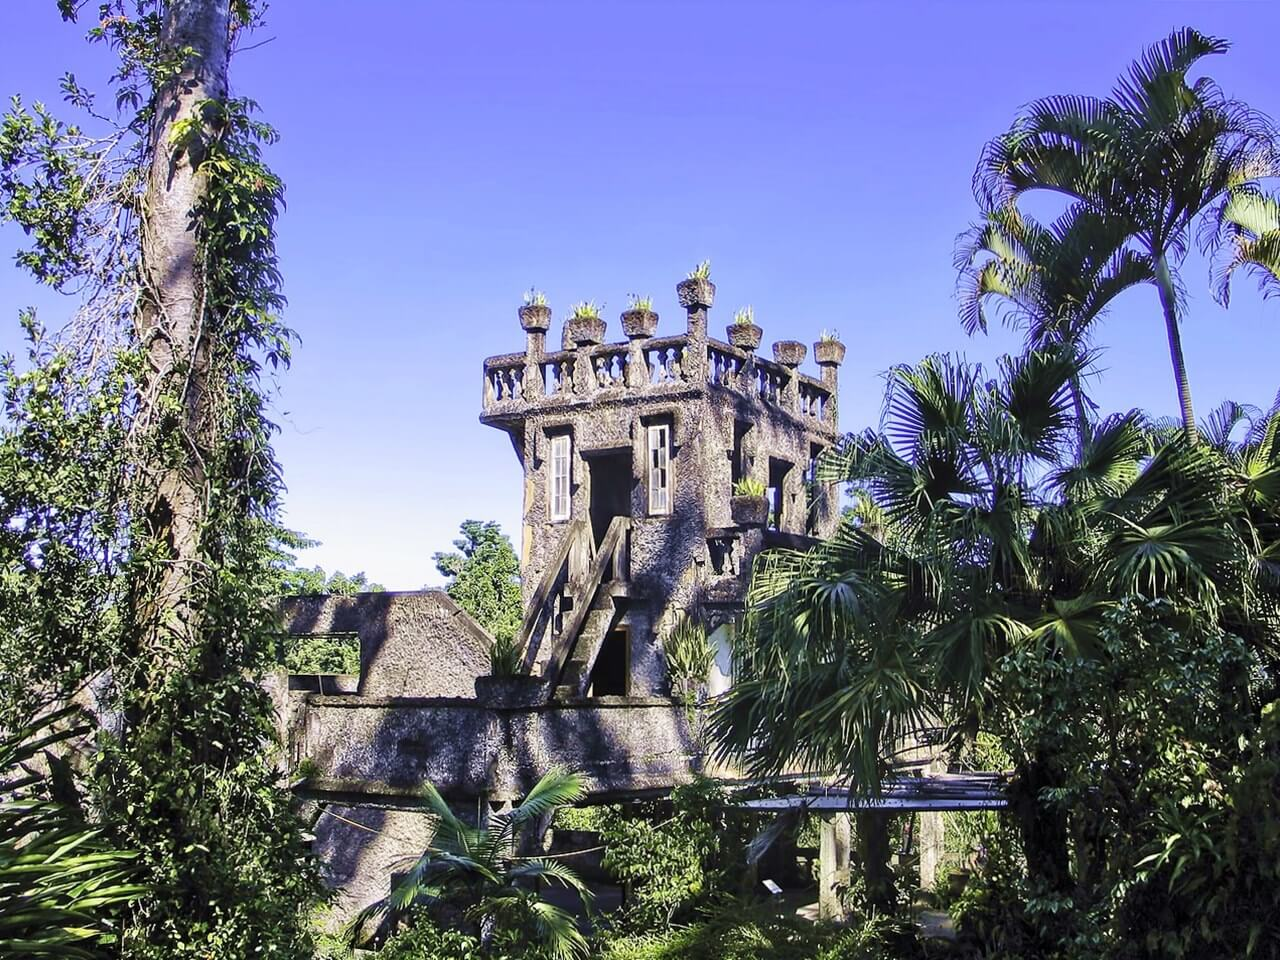 凱恩斯-景點-推薦-帕羅尼拉公園-旅遊-自由行-澳洲-Cairns-Tourist-Attraction-Paronella-Park-Travel-Australia